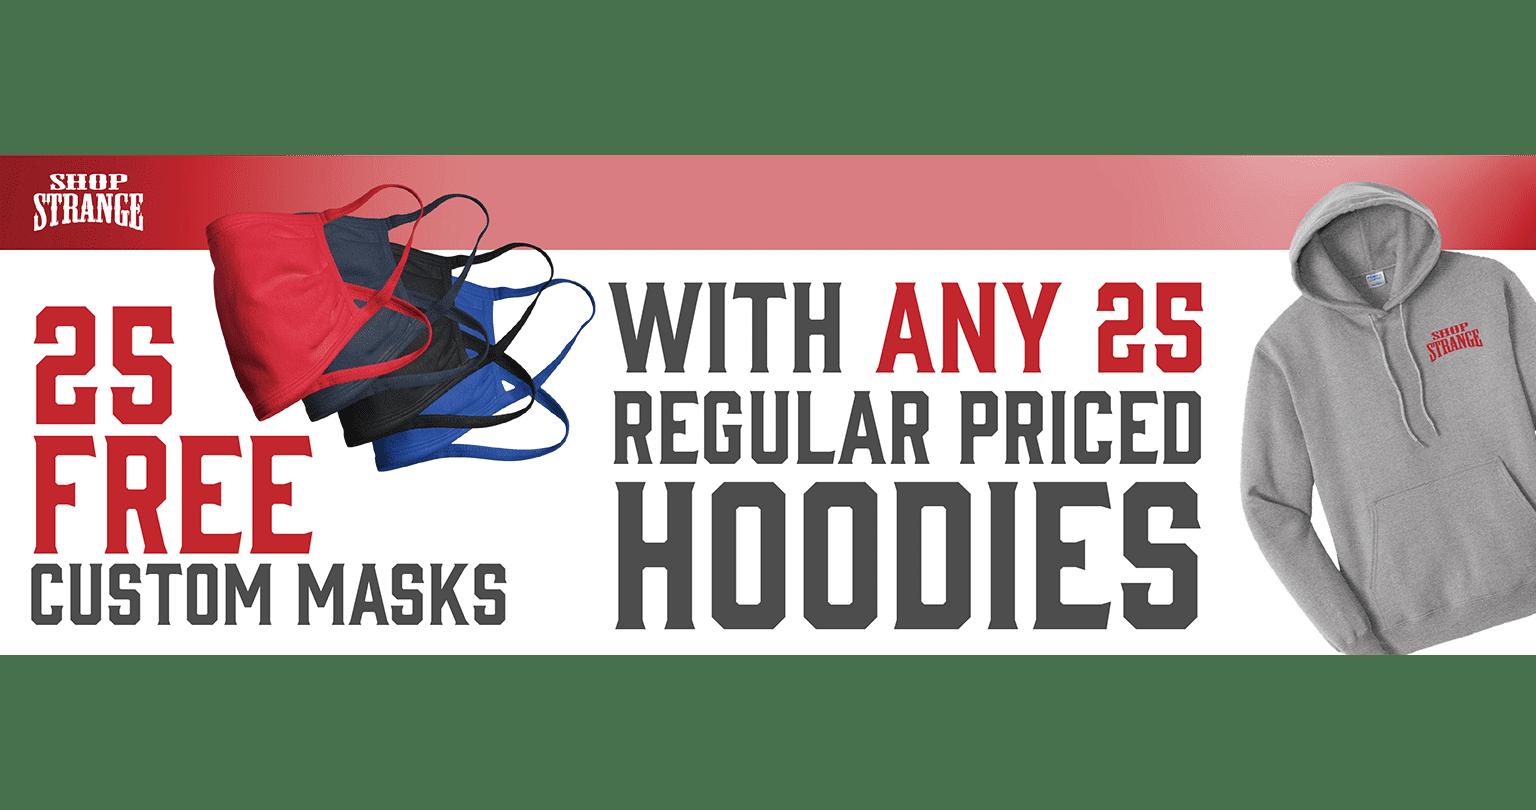 FREE Masks November Special 23